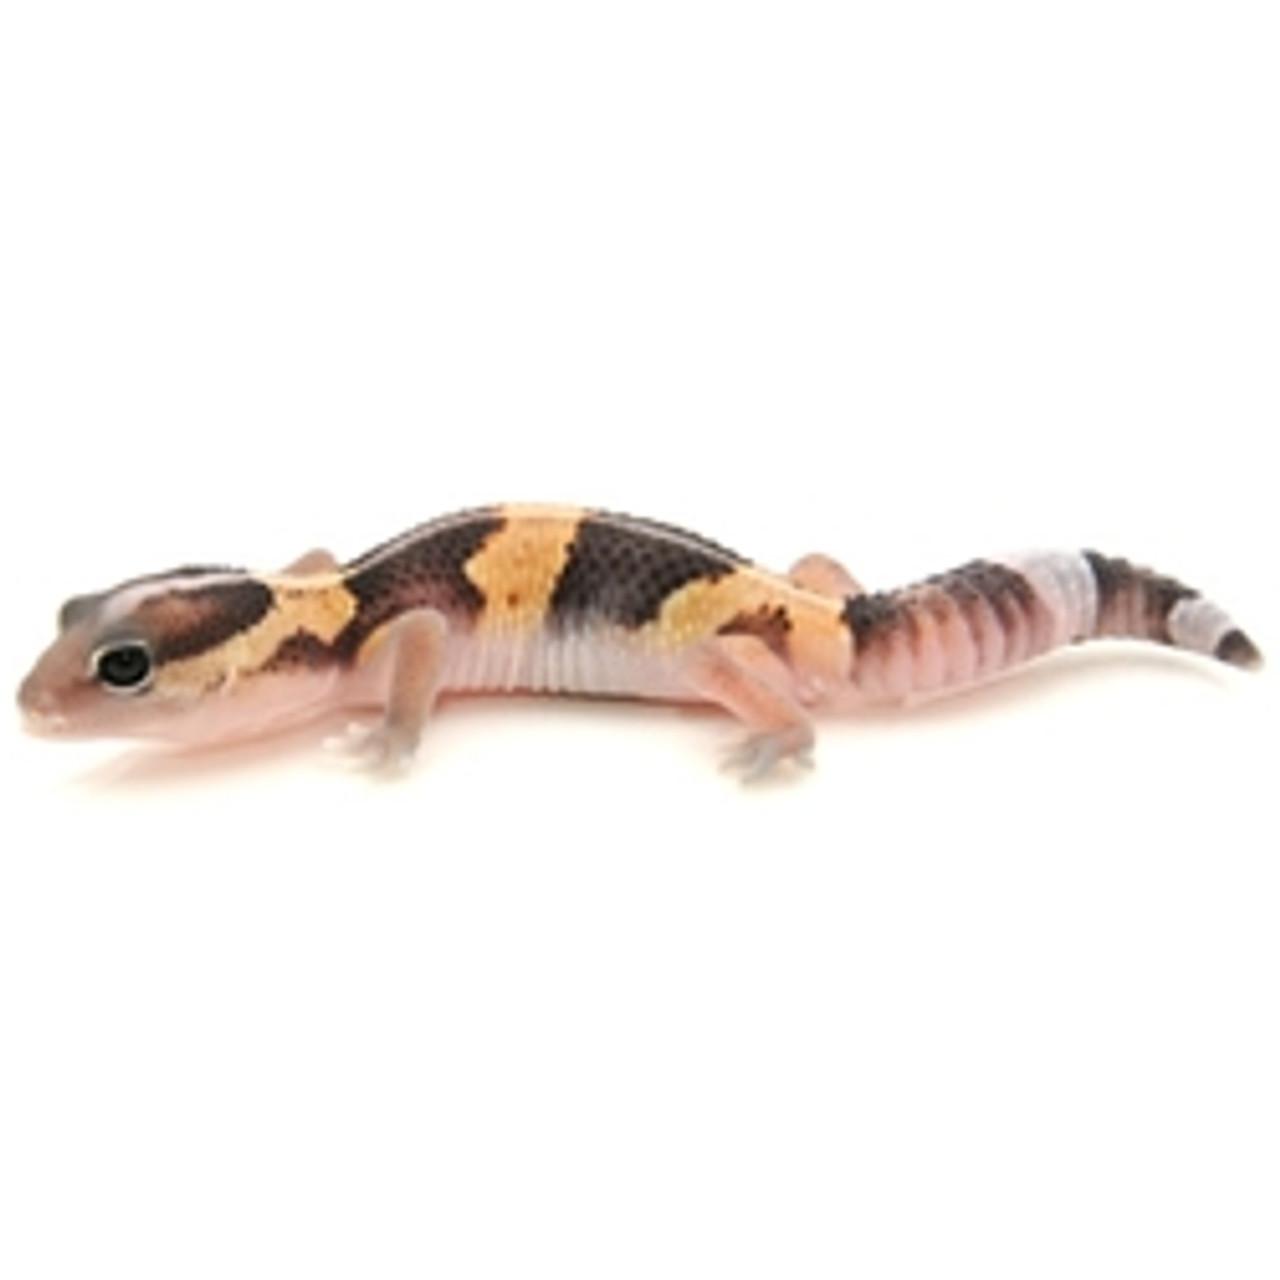 African Fat Tail Gecko (Hemitheconyx caudicinctus) Adult